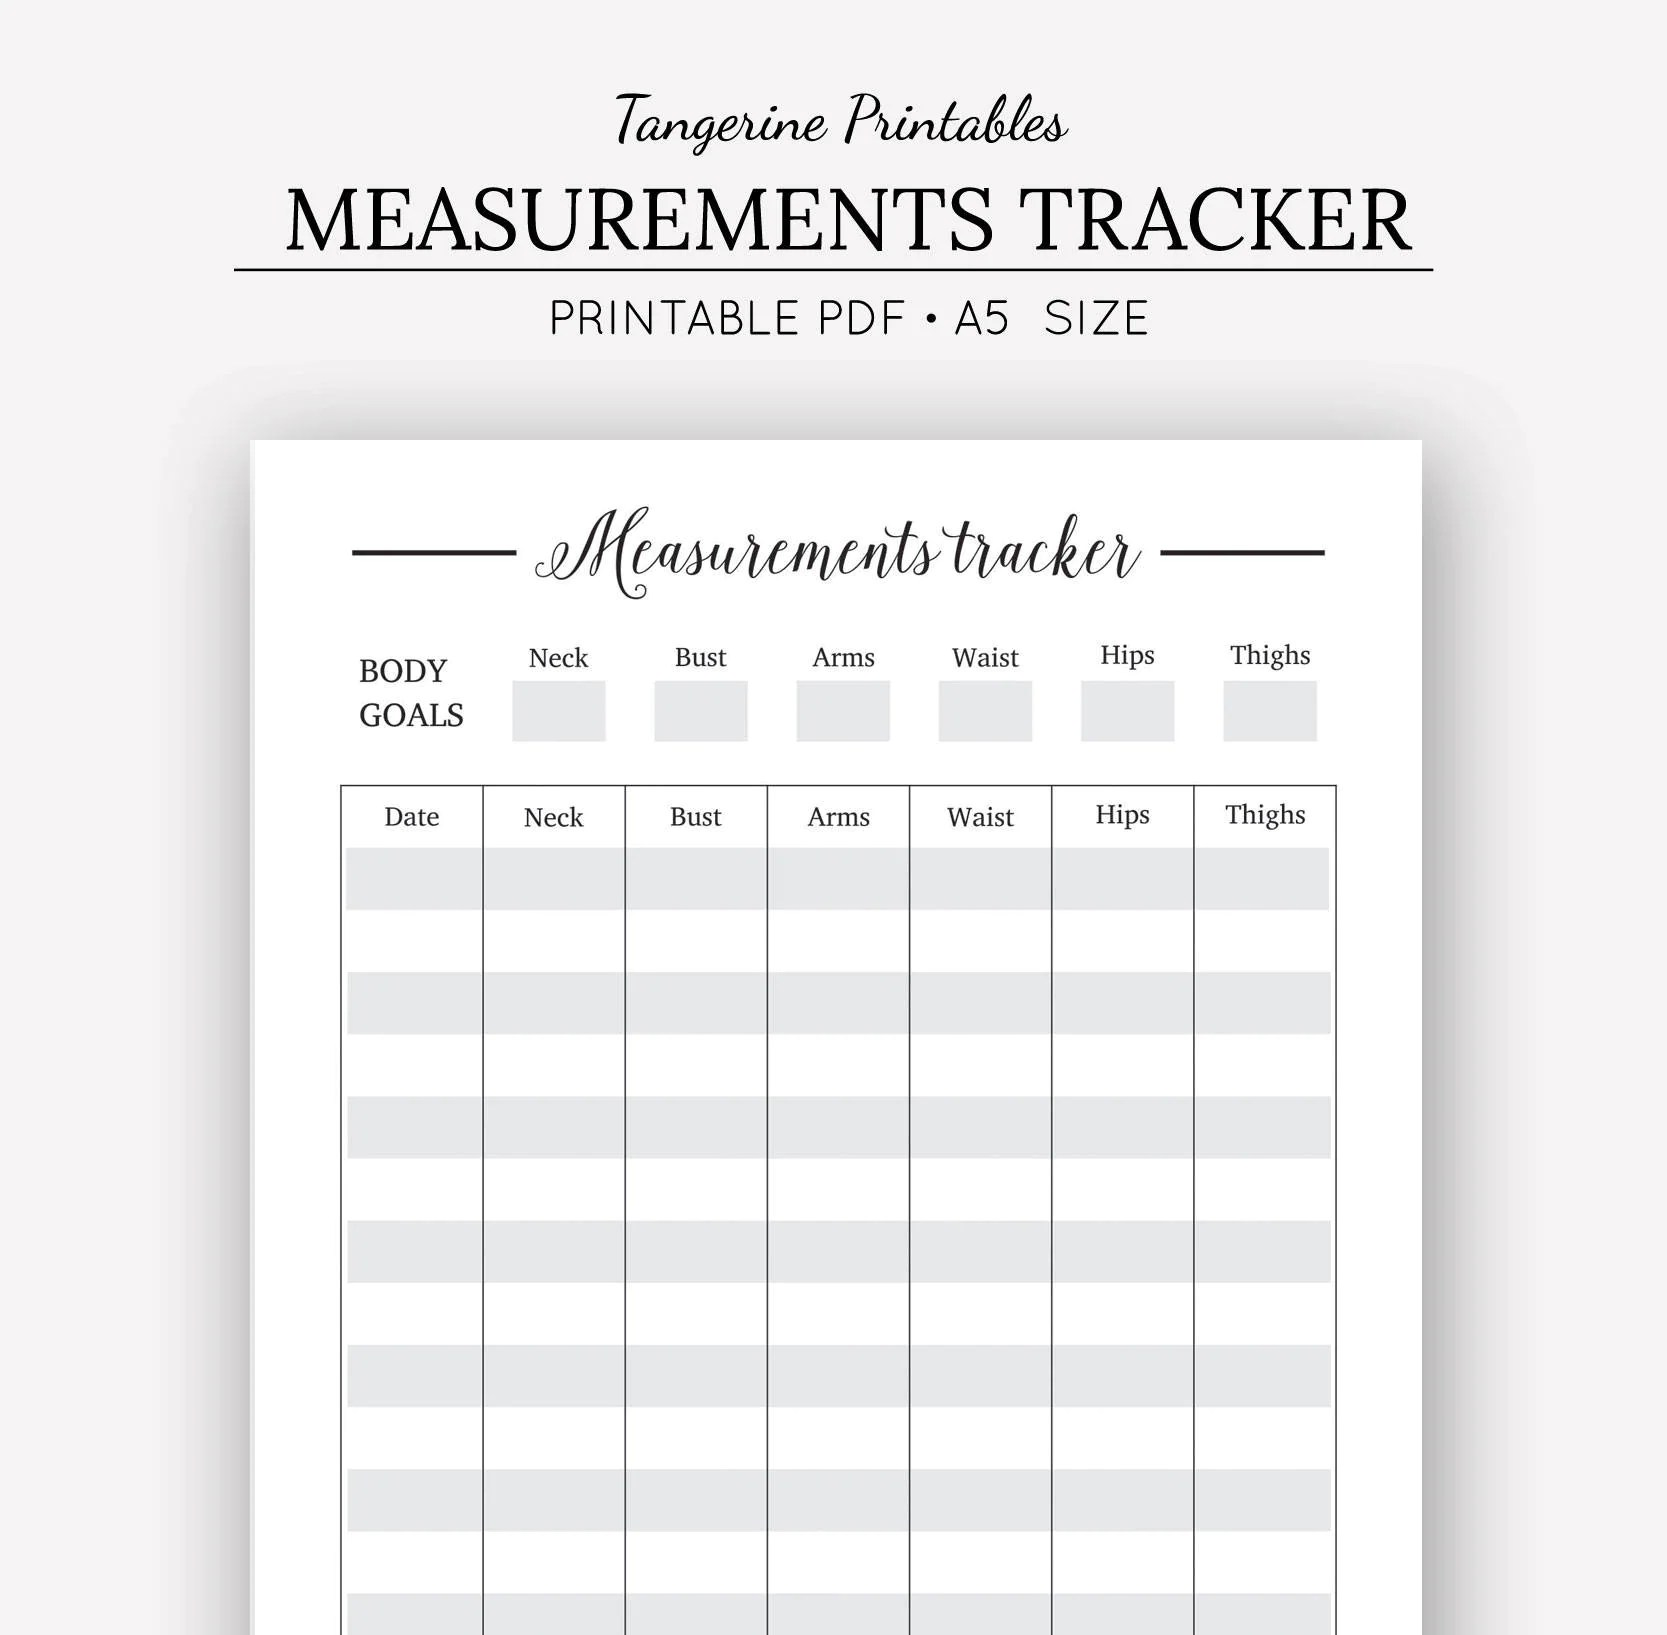 Measurement Tracker Printable Planner A5 Printables Body